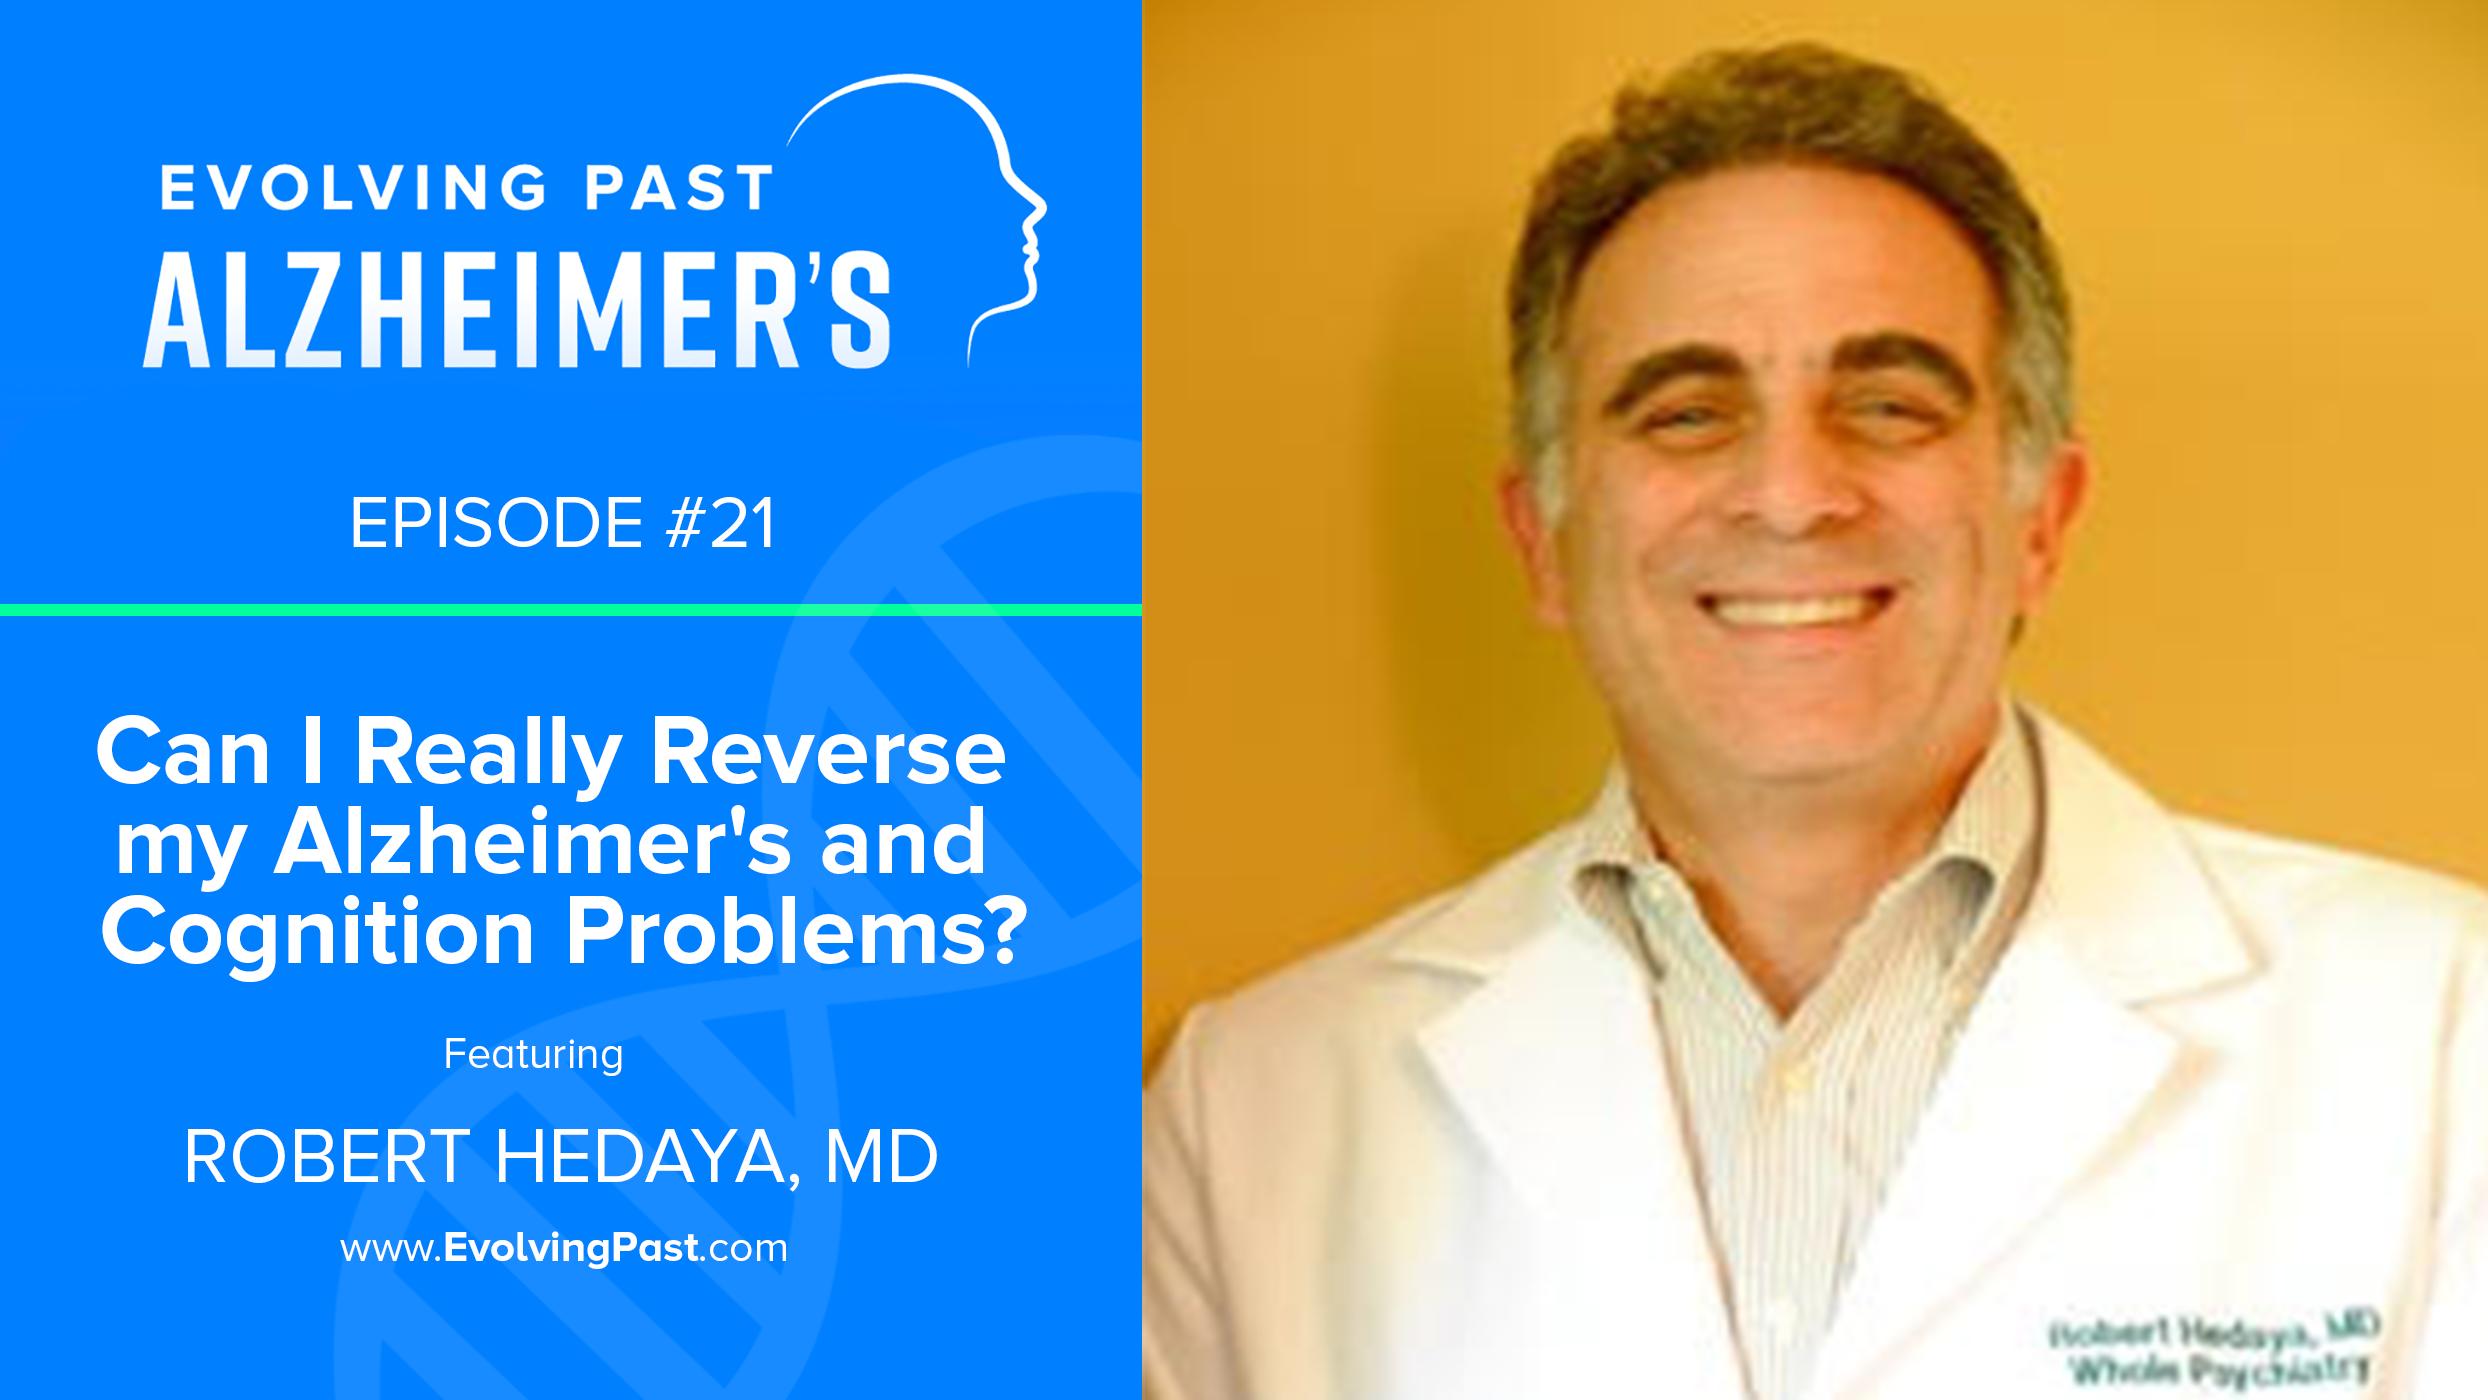 Evolving Past Alzheimer's - Episode 21 Robert Hedaya